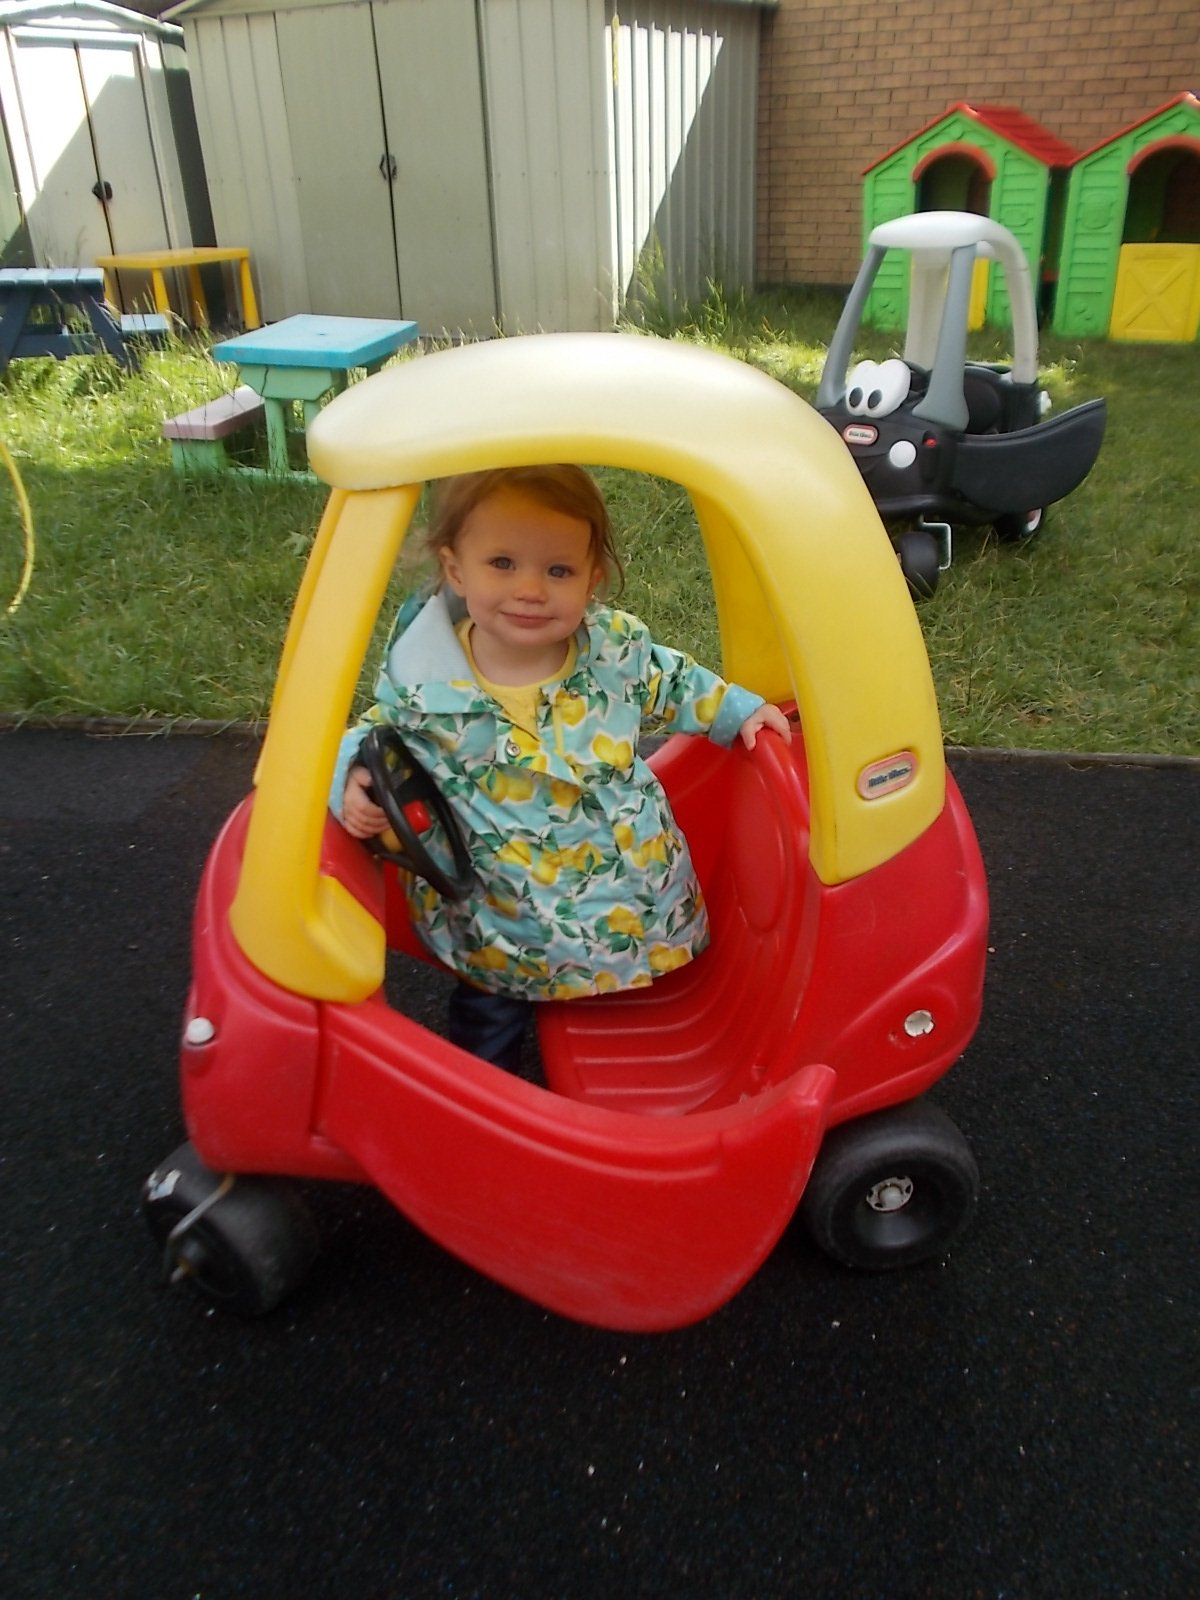 baby inside play car